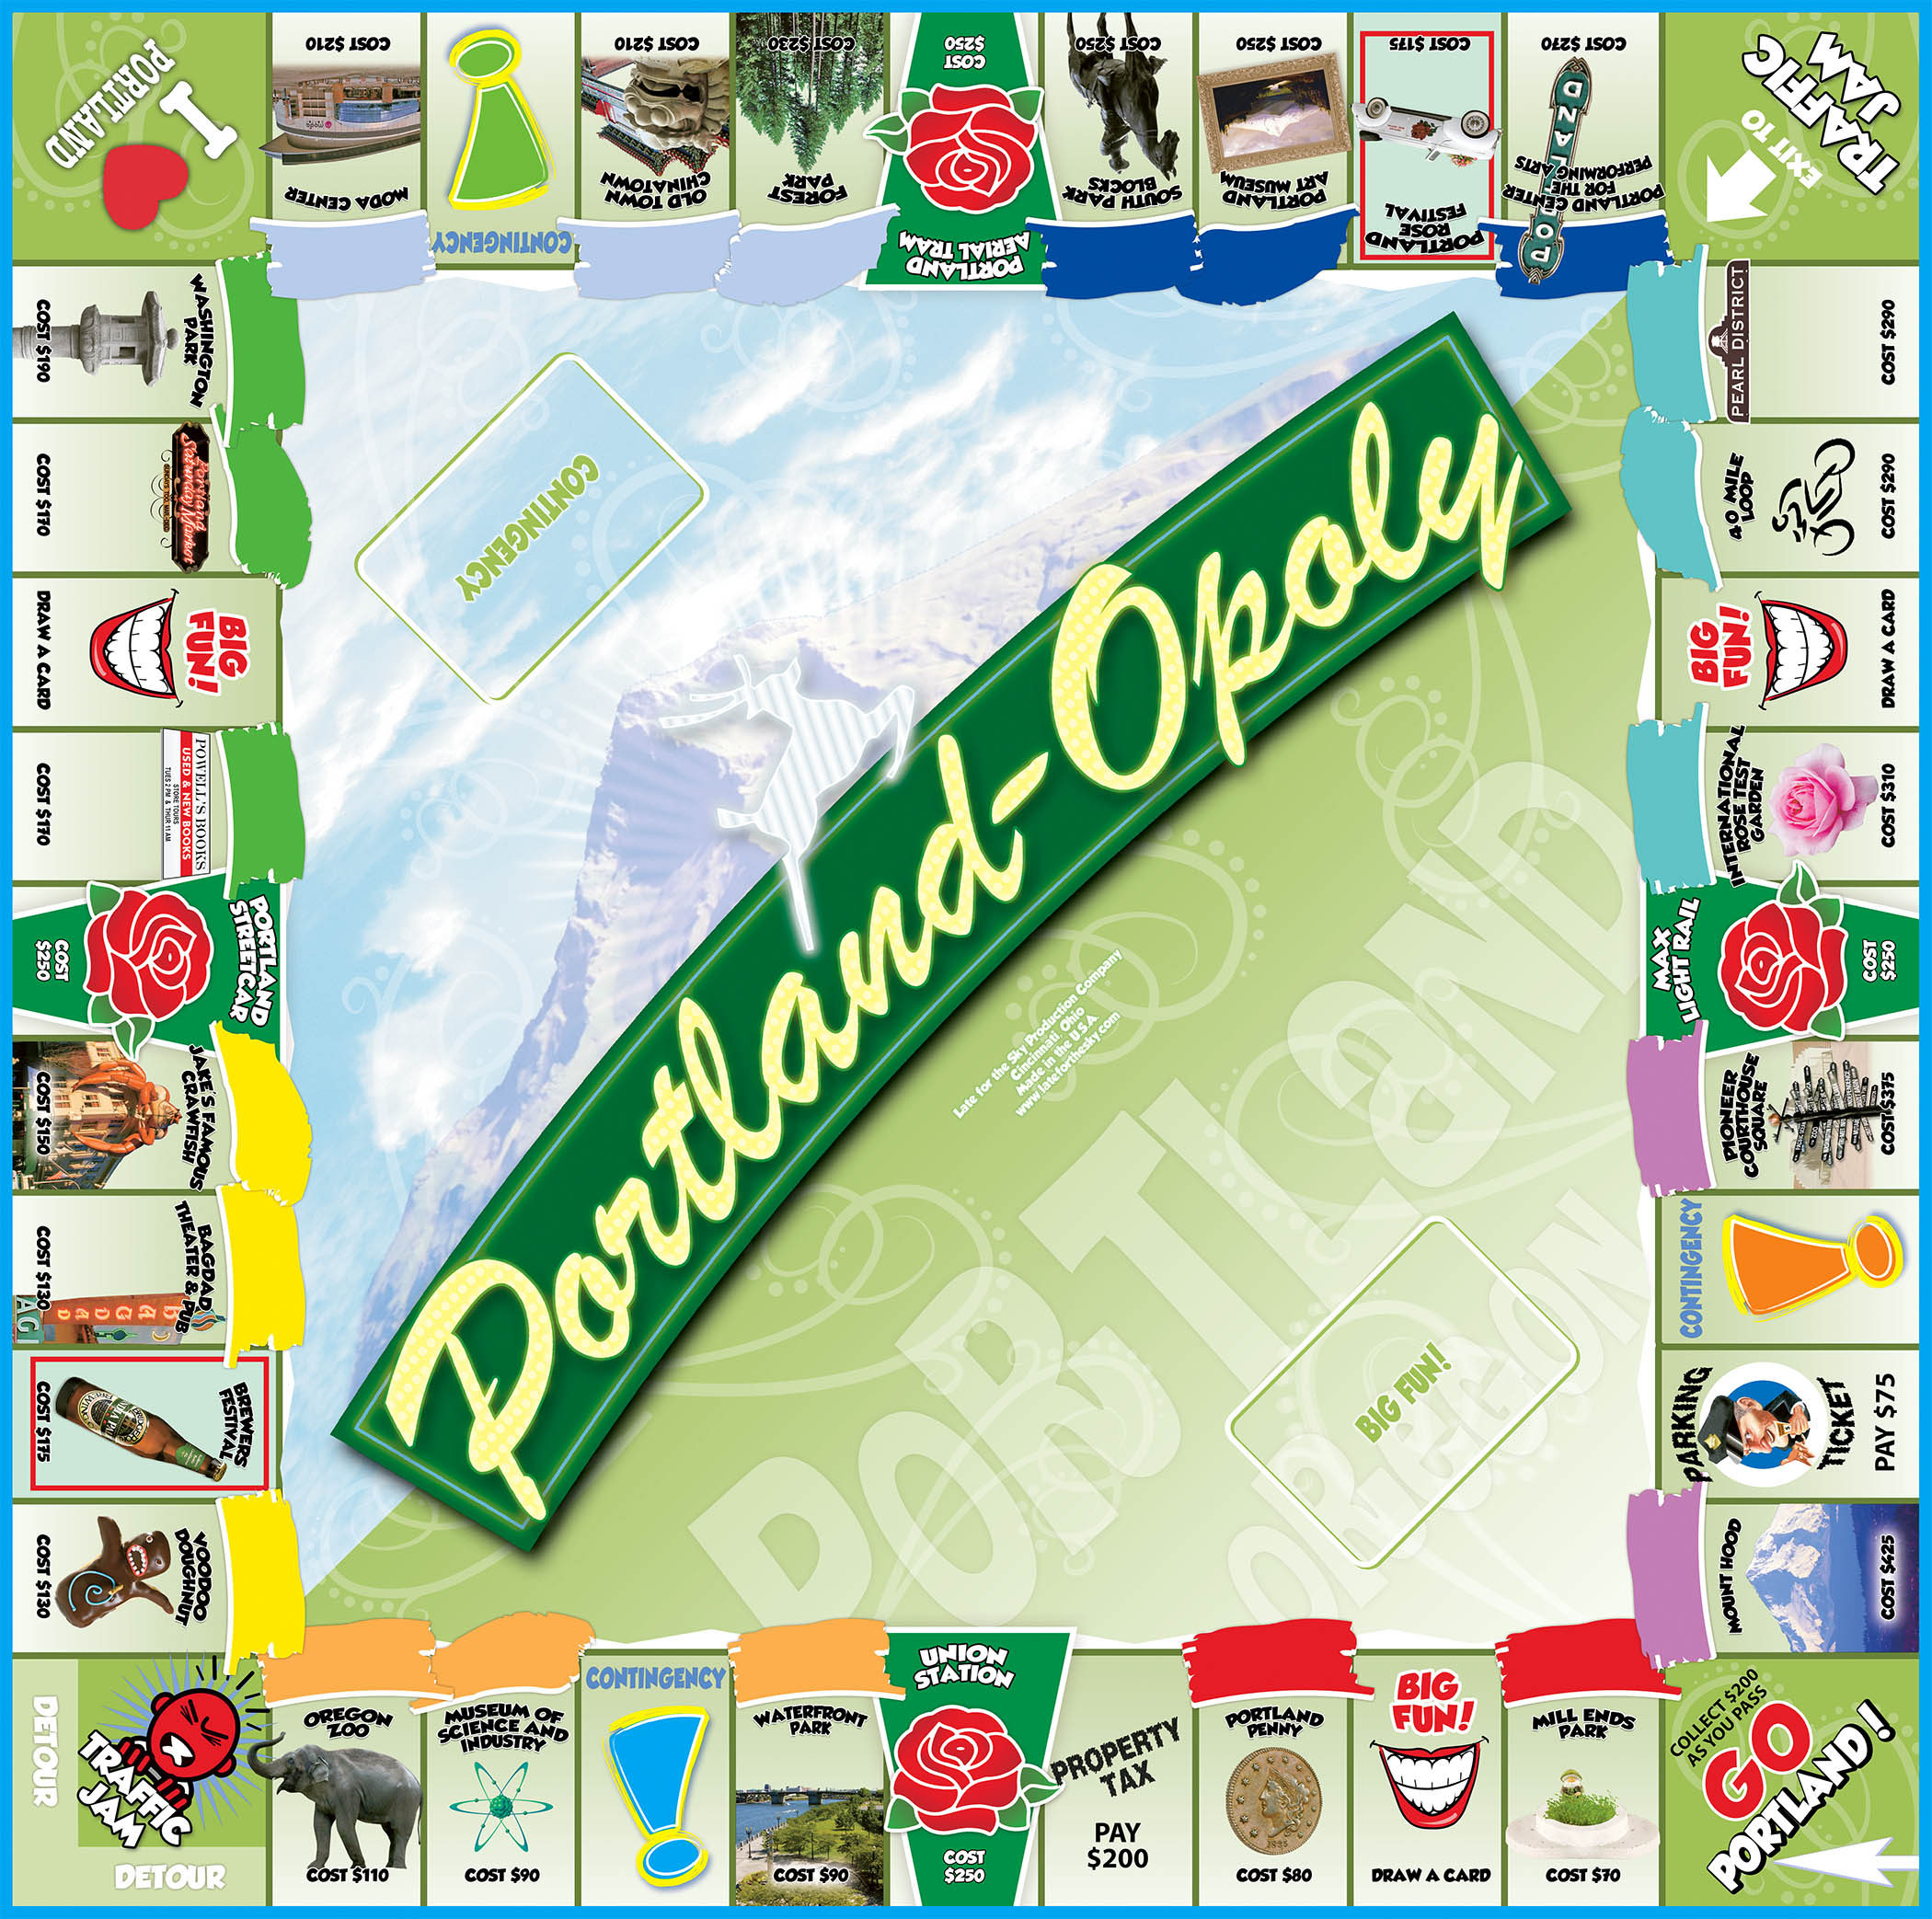 PORTLAND-OPOLY Board Game